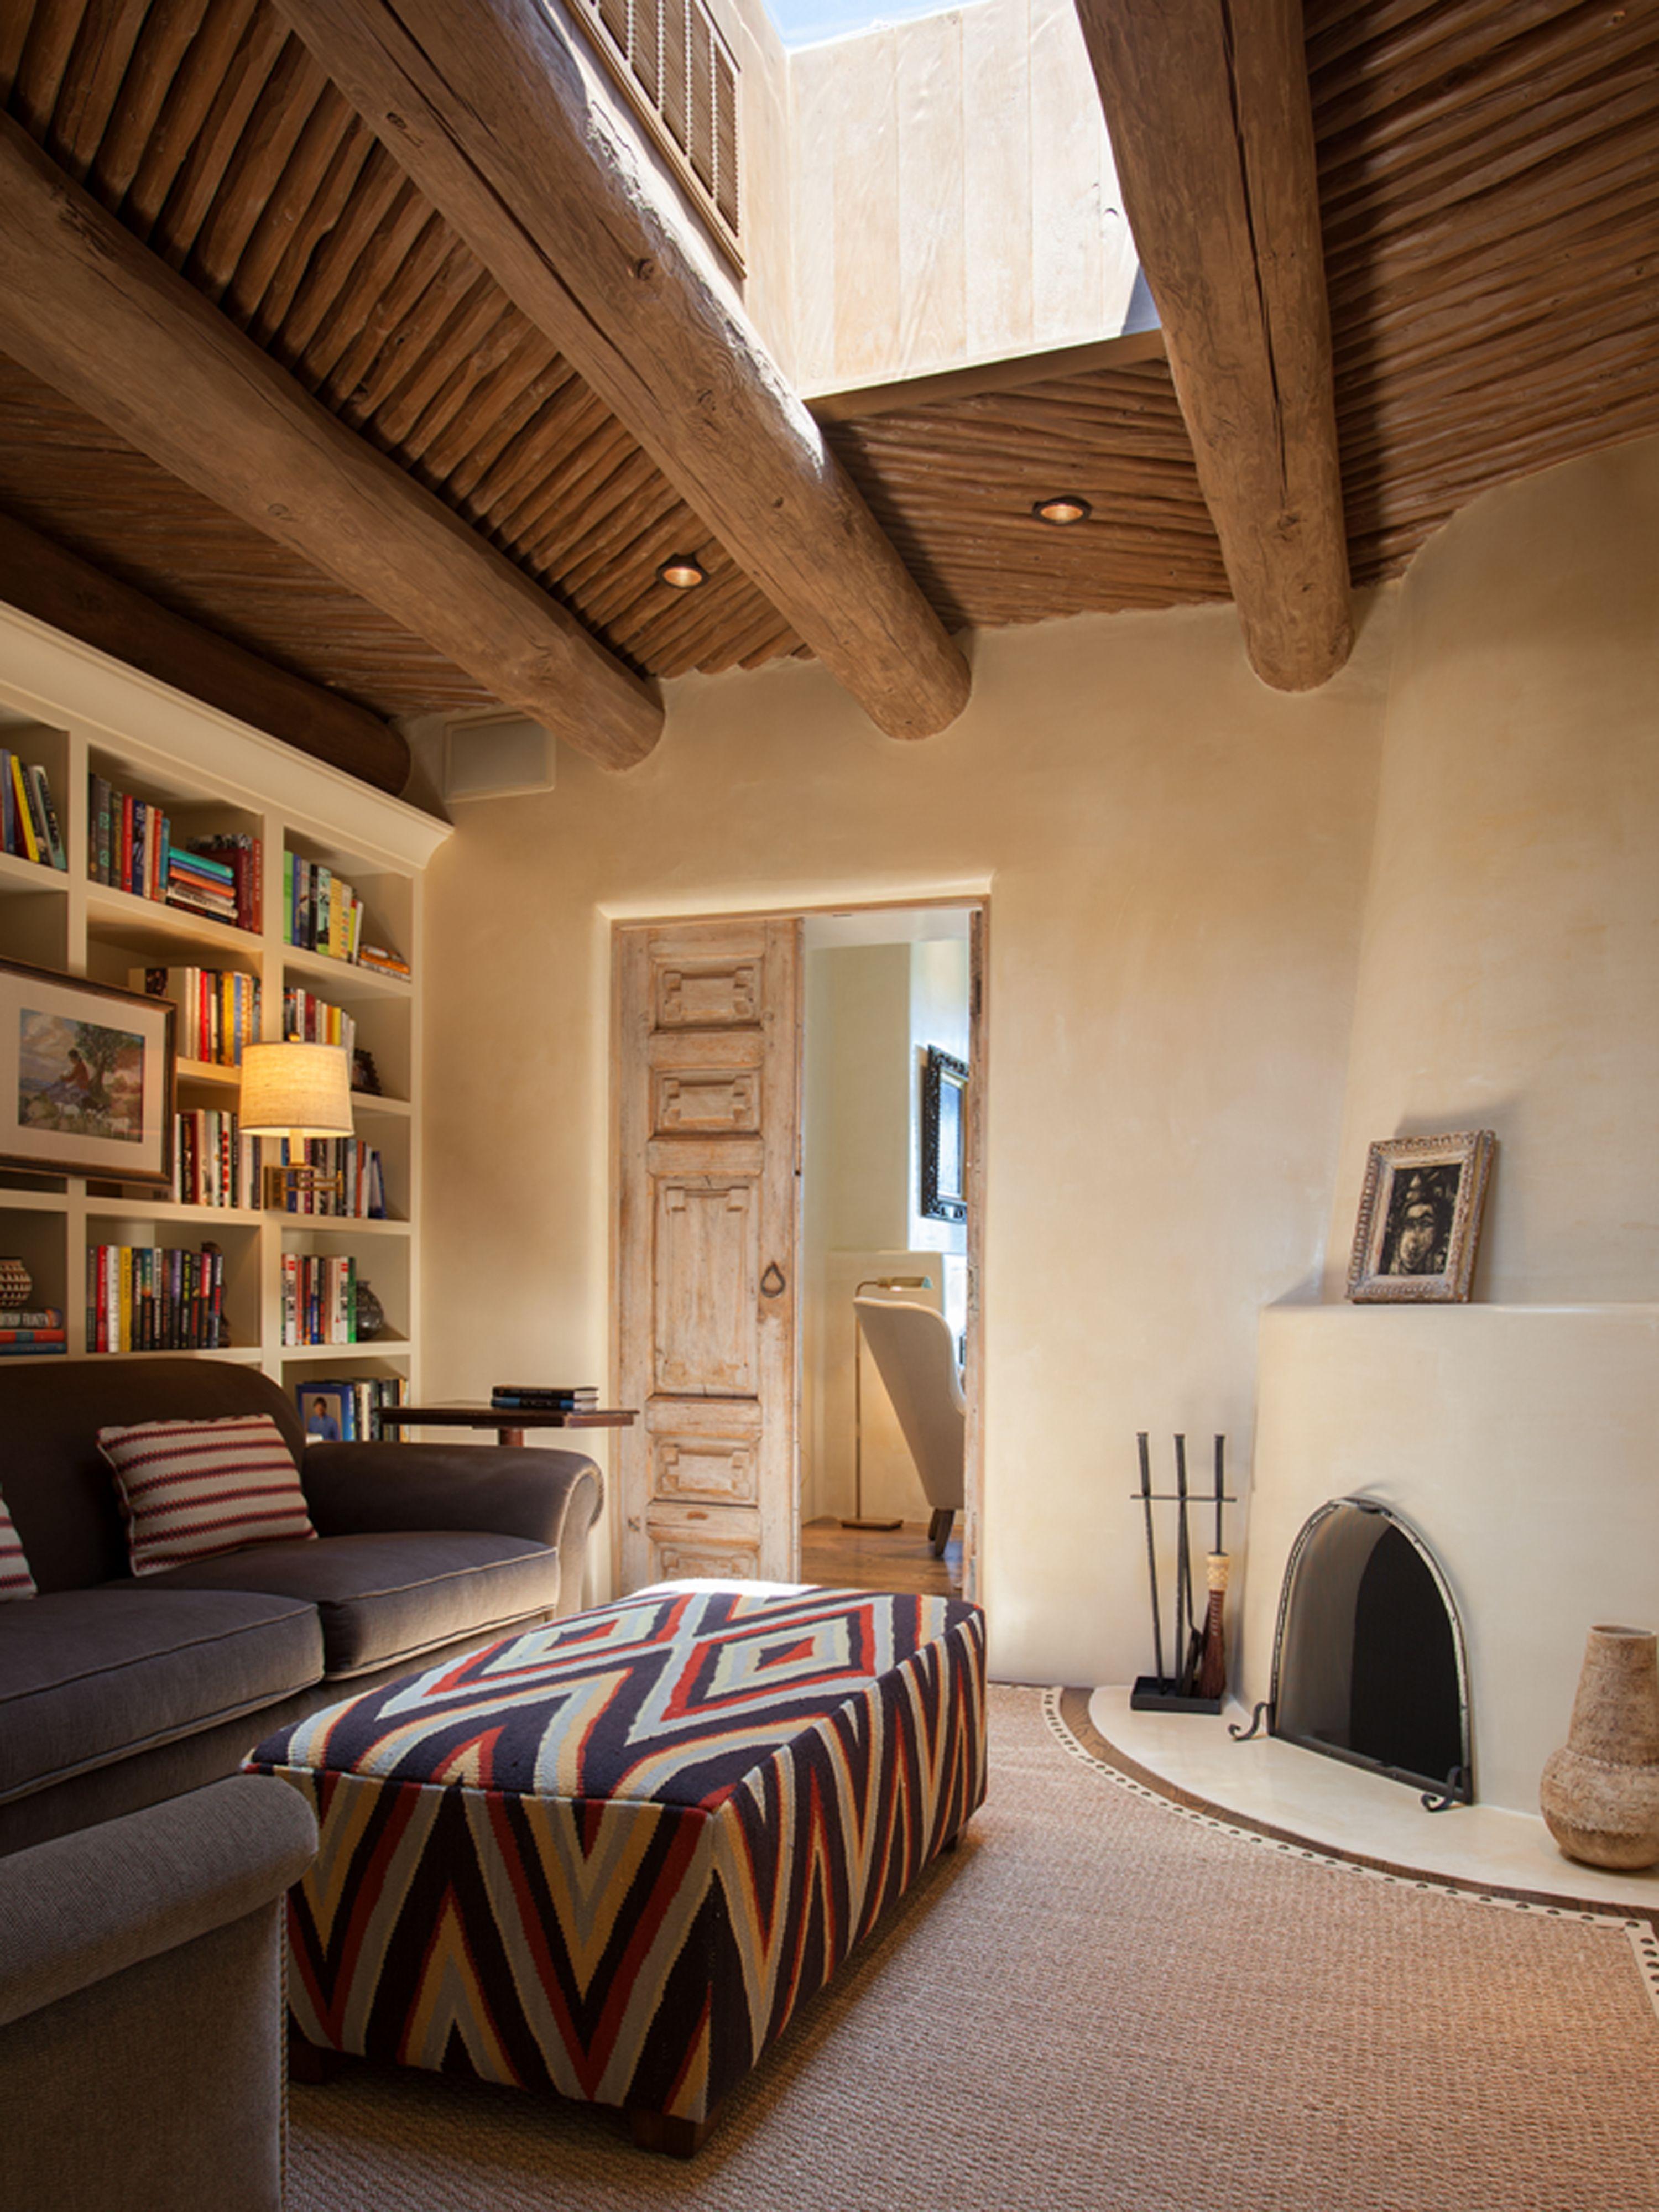 Step Inside A Stunning Adobe Home In Santa Fe Adobe House Southwestern Home Southwestern Decorating